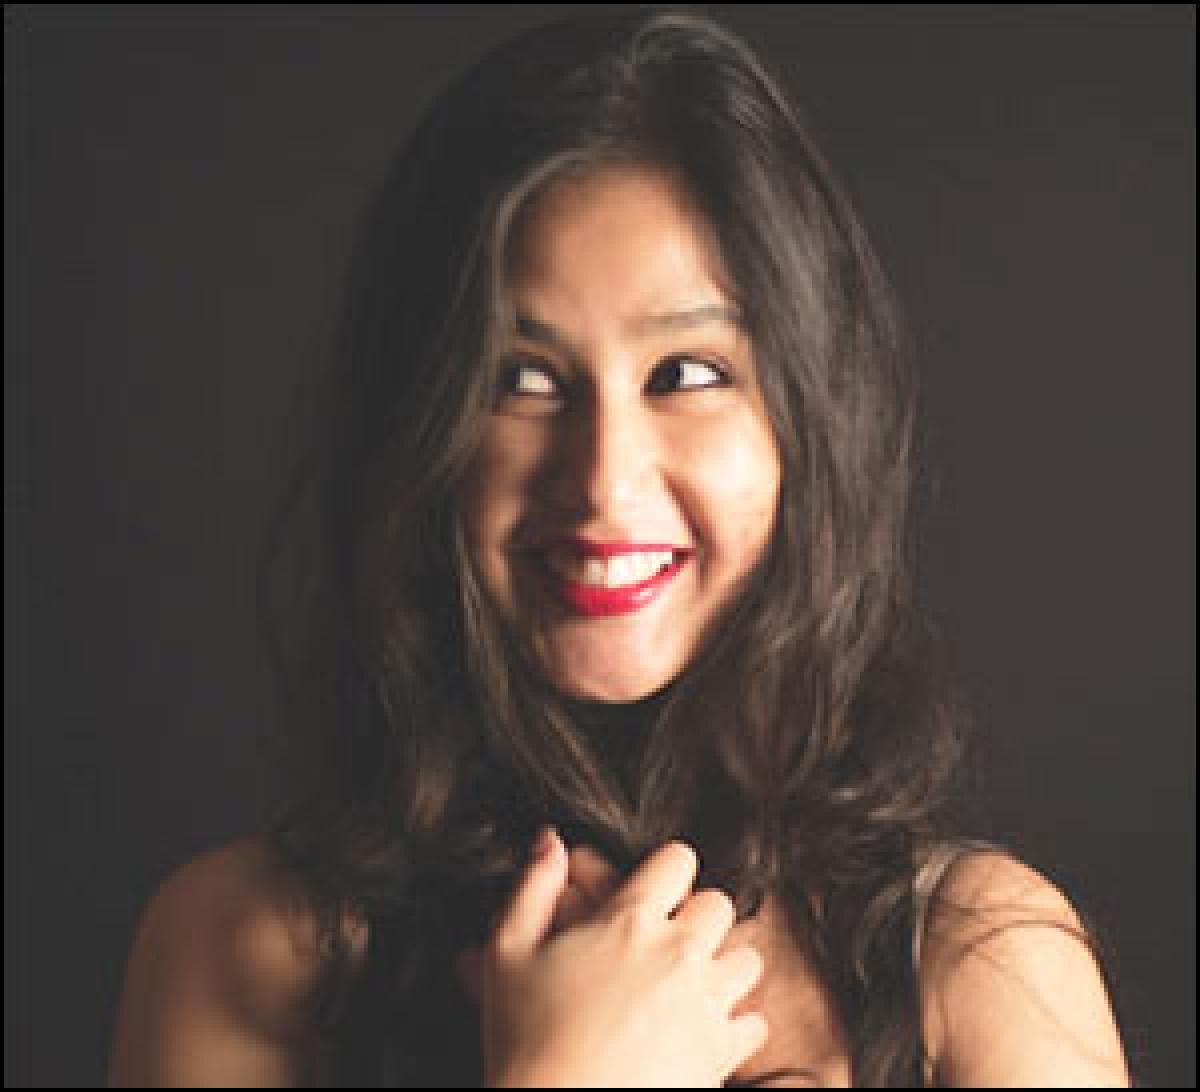 Meet the New Airtel Girl: Sasha Chettri